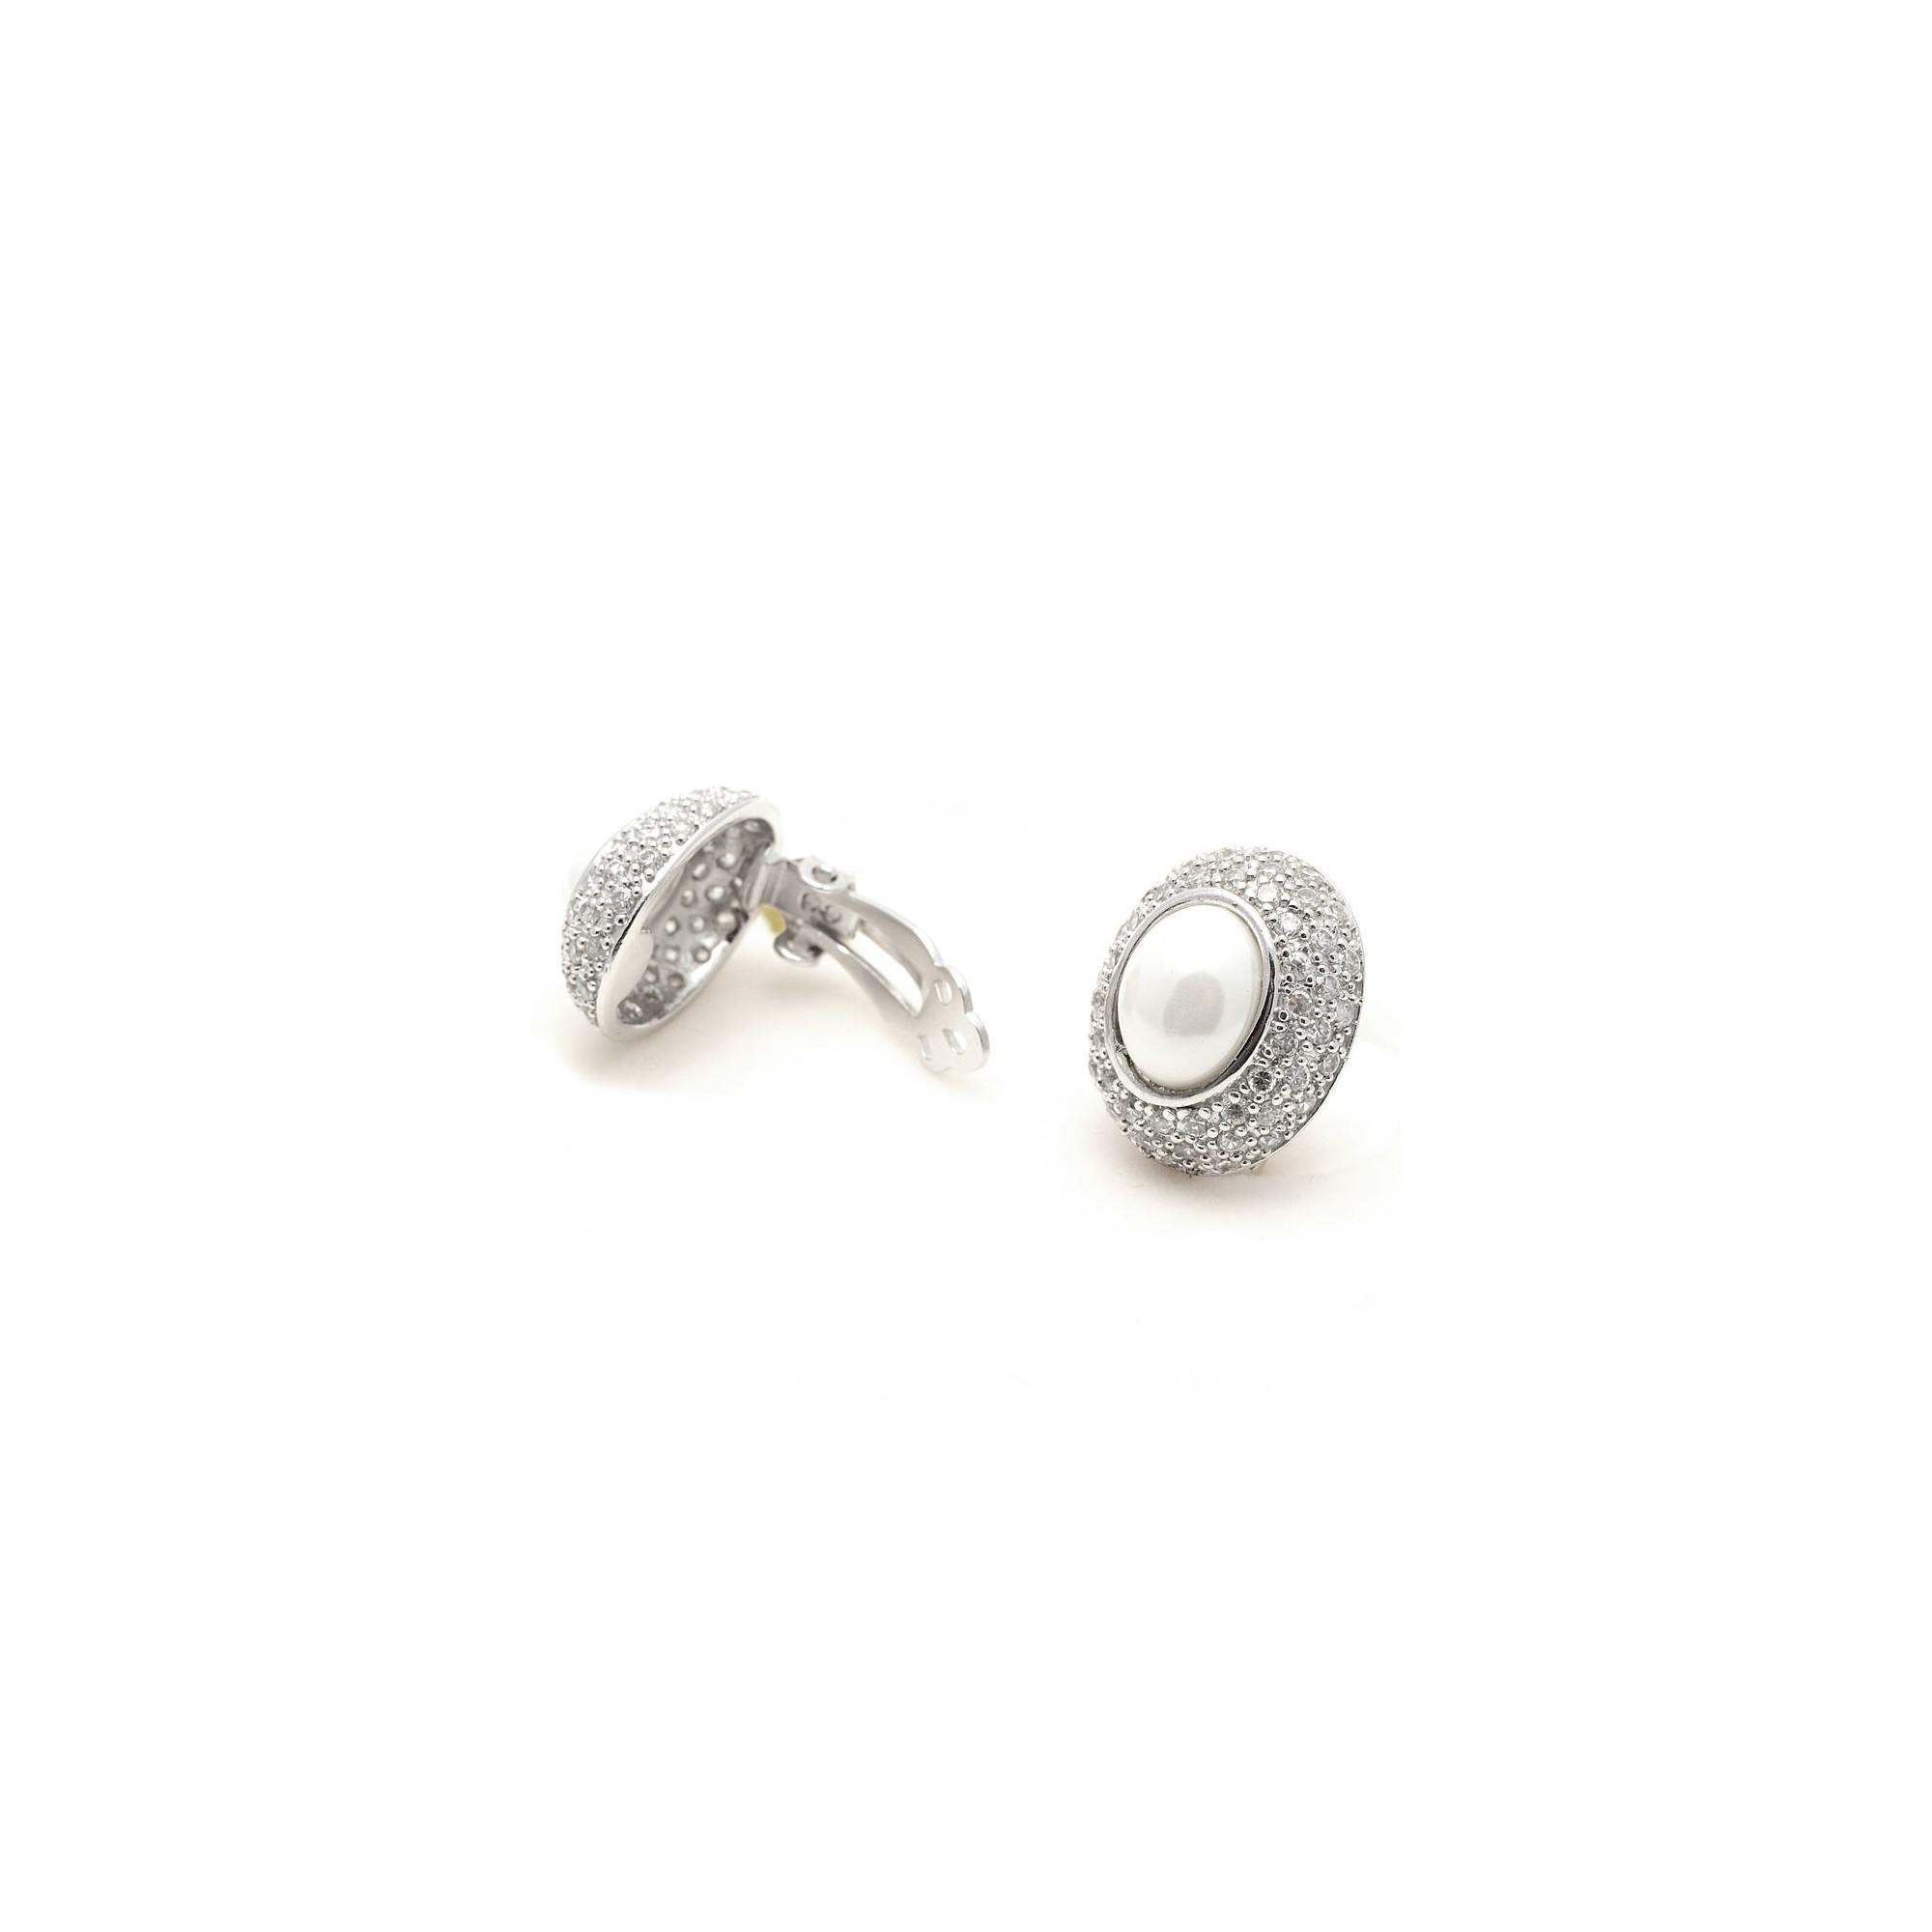 a6b24049f67e Pendientes Clip Plata Perla Cristales